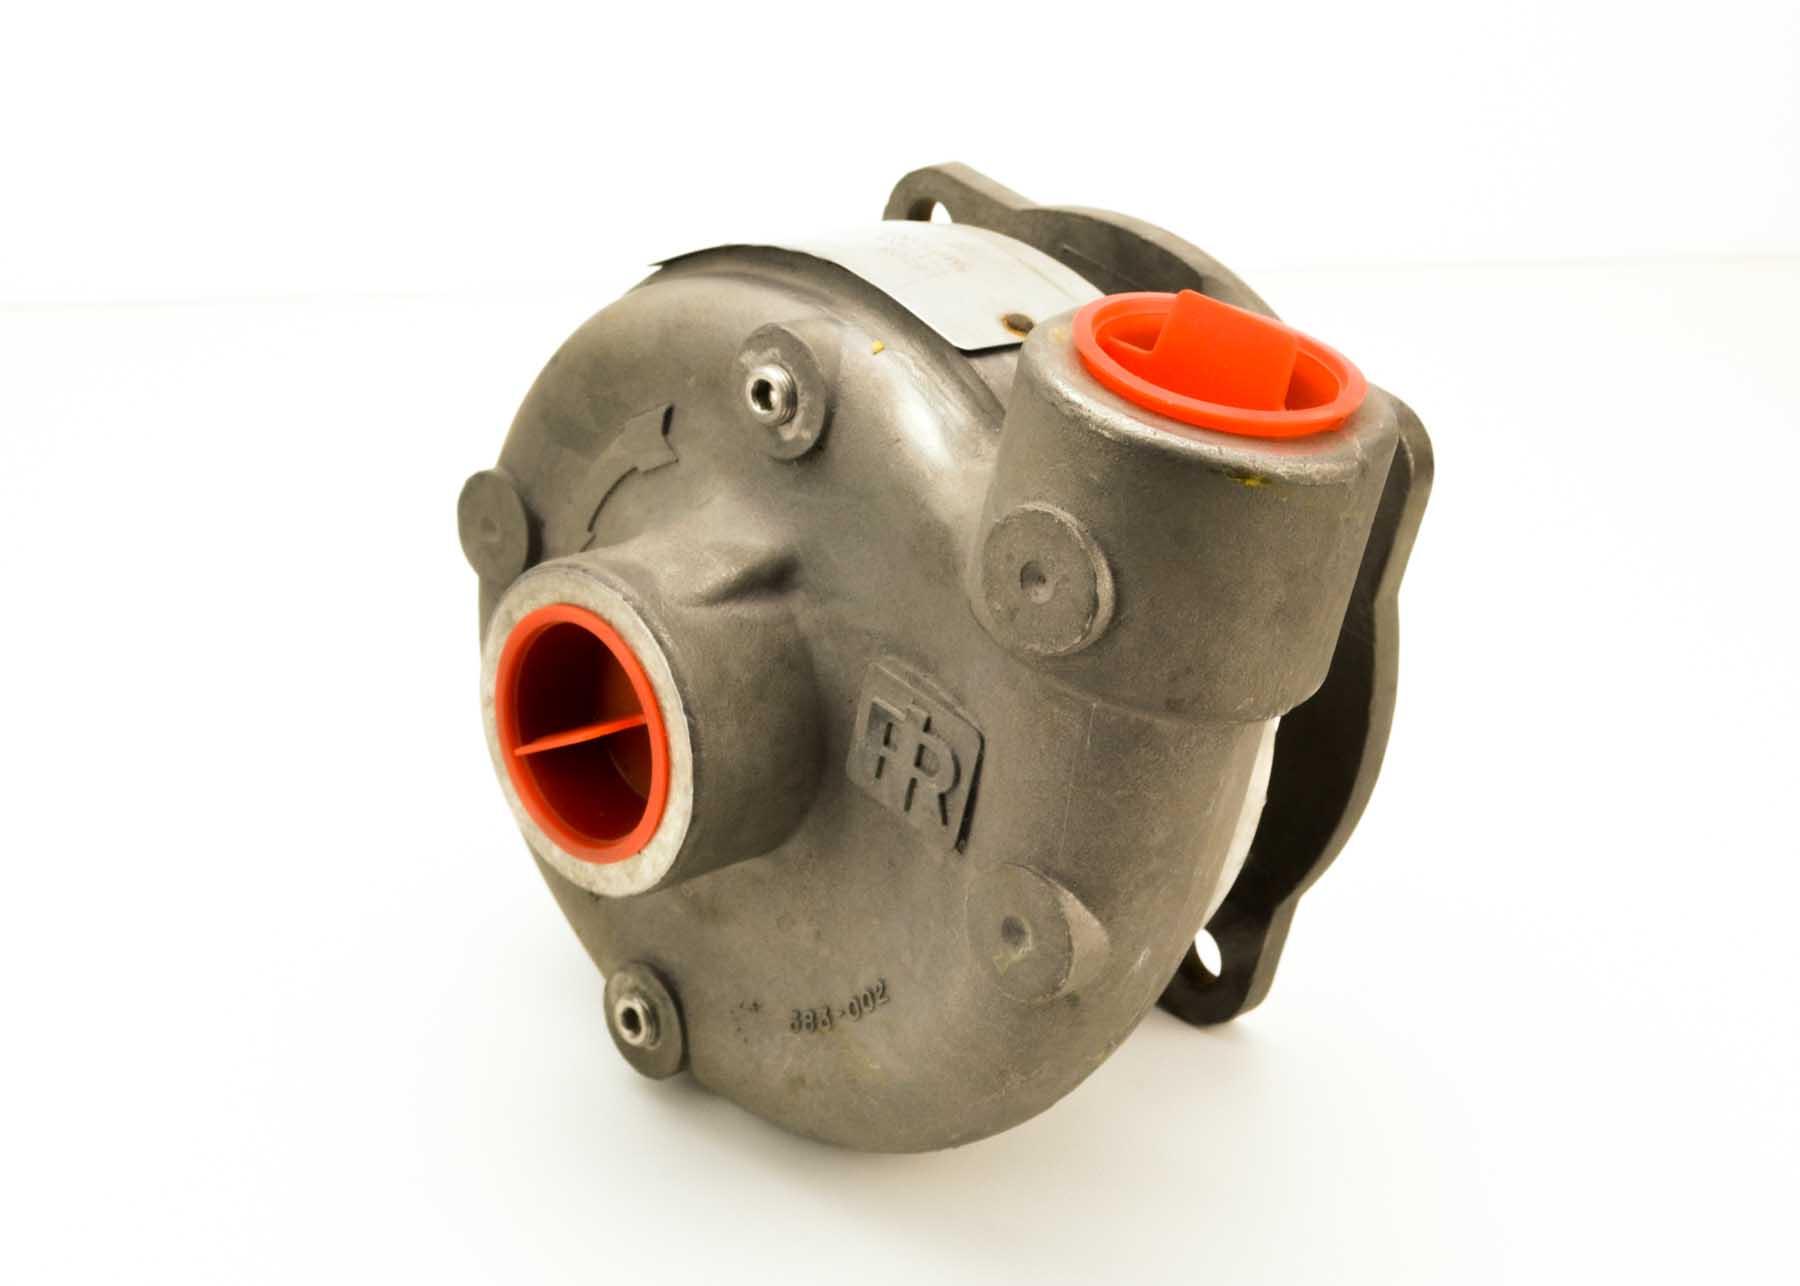 Ingersoll-Dresser SMP1000 Stainless Pump